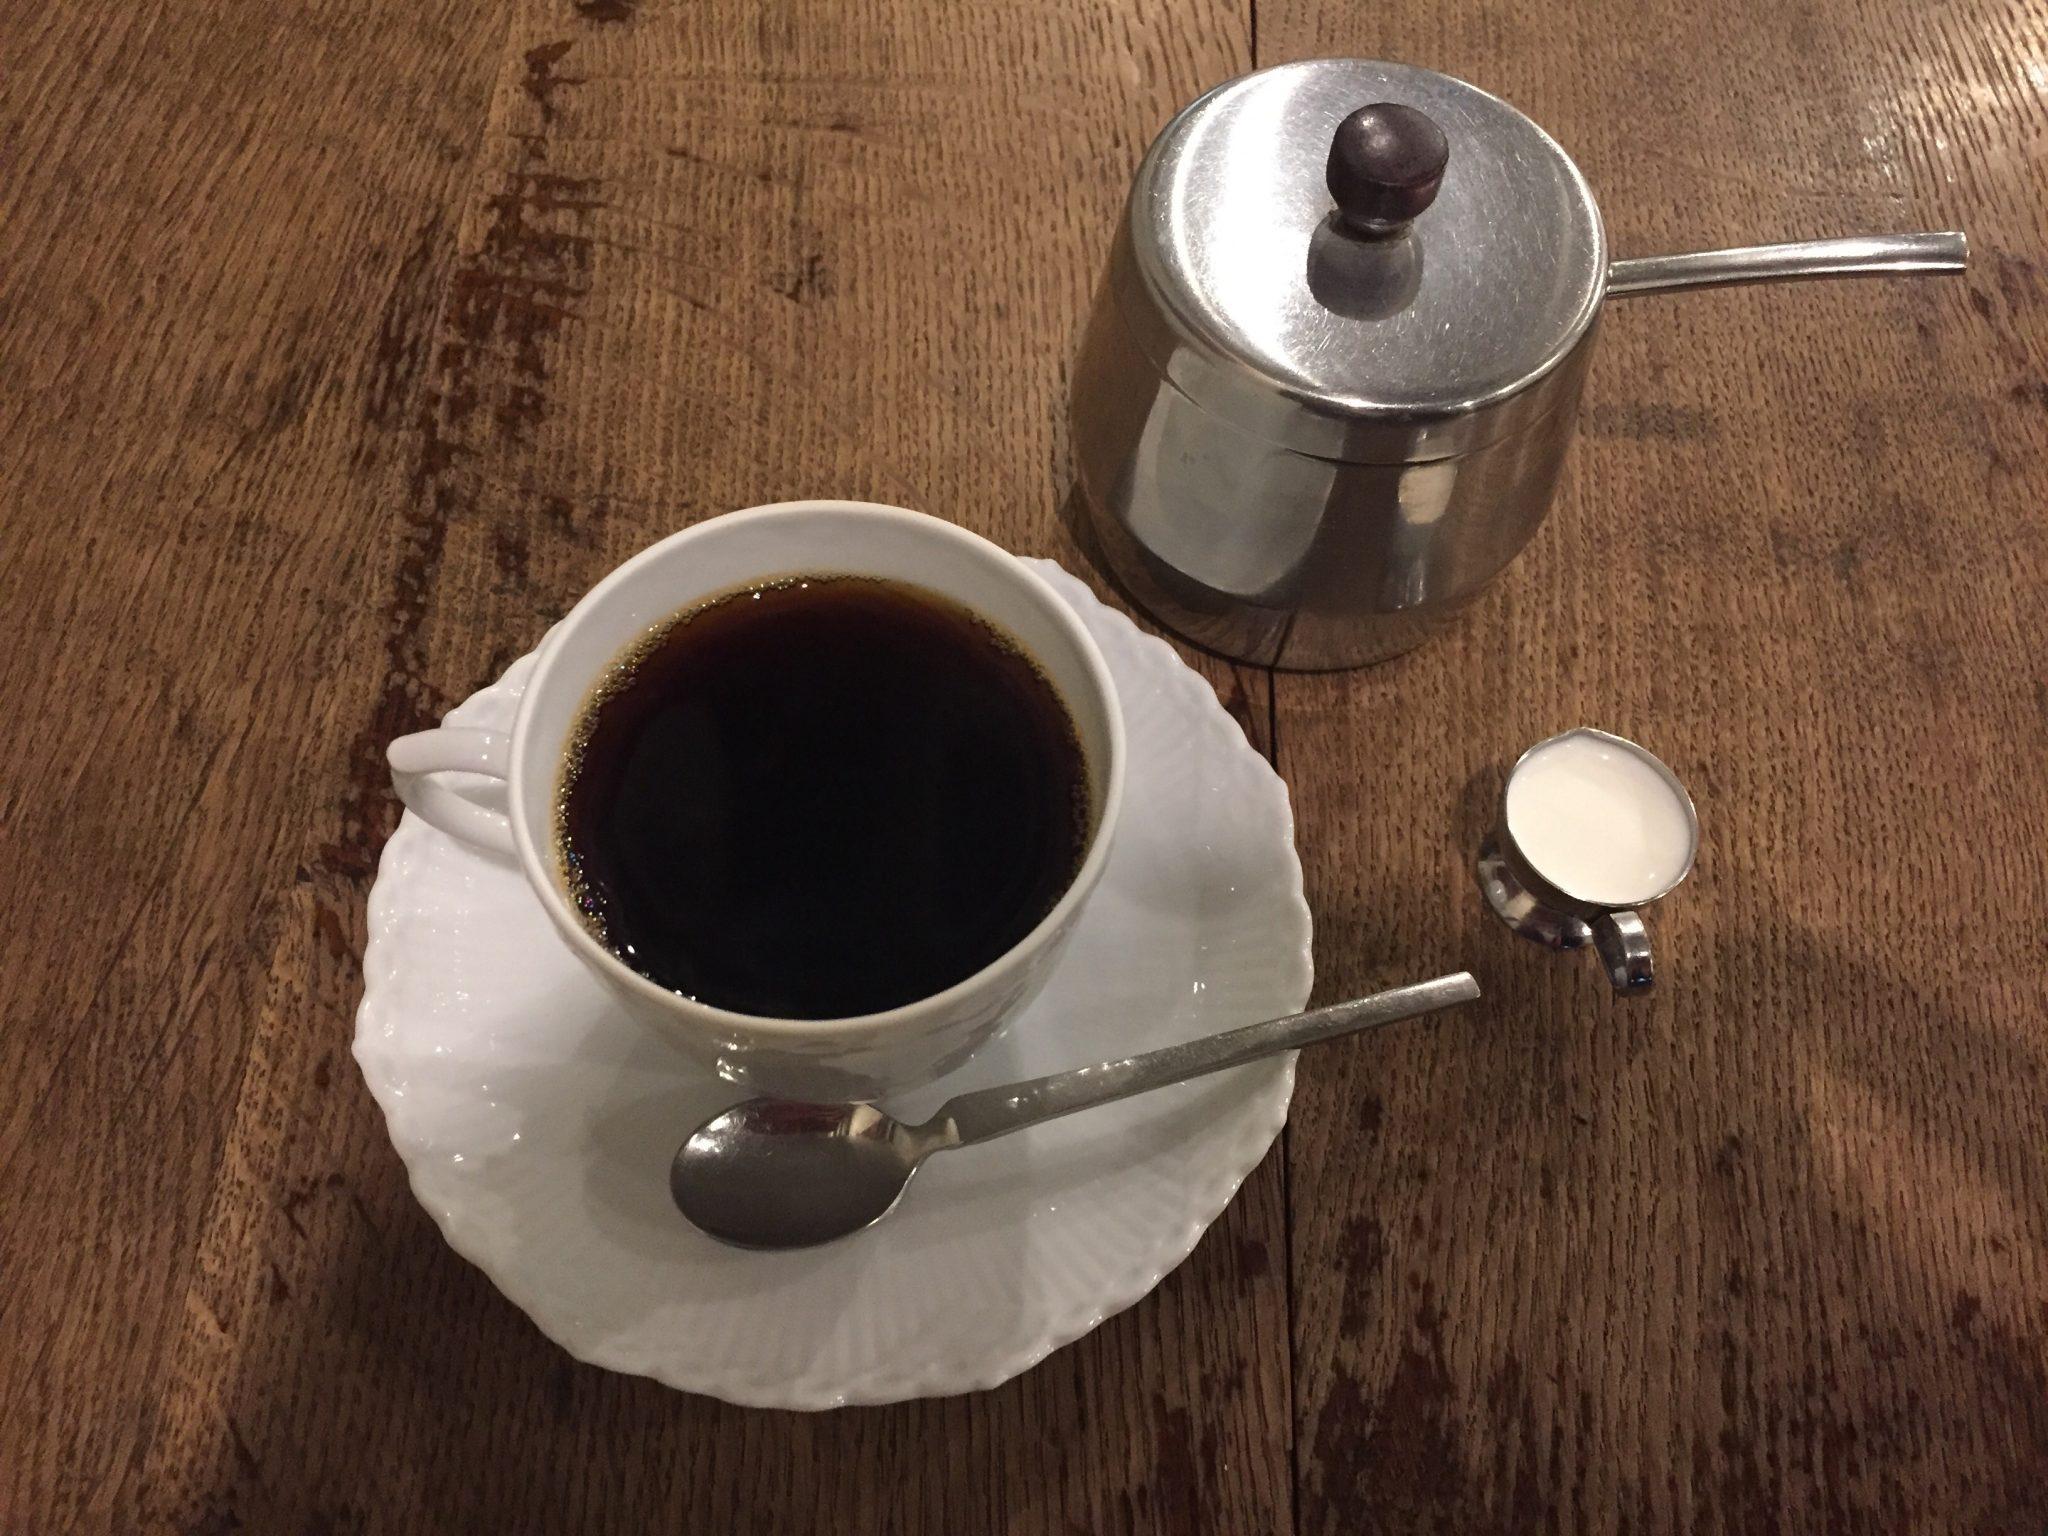 Ban coffee